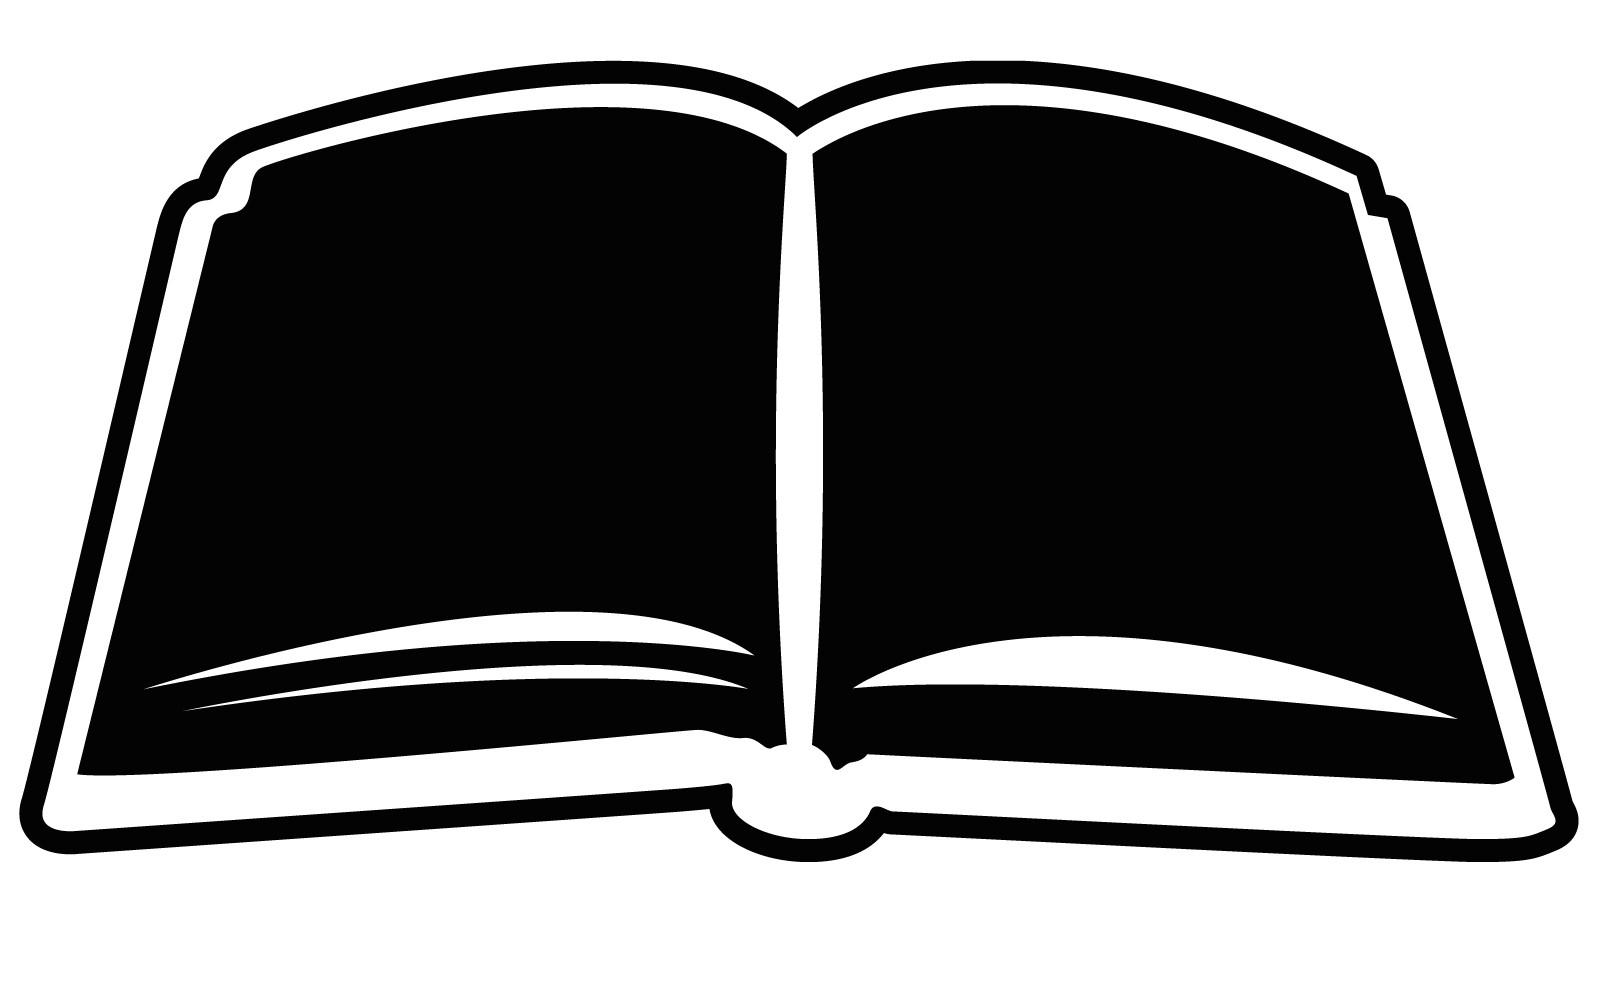 Generic book paso evolist. Books clipart simple